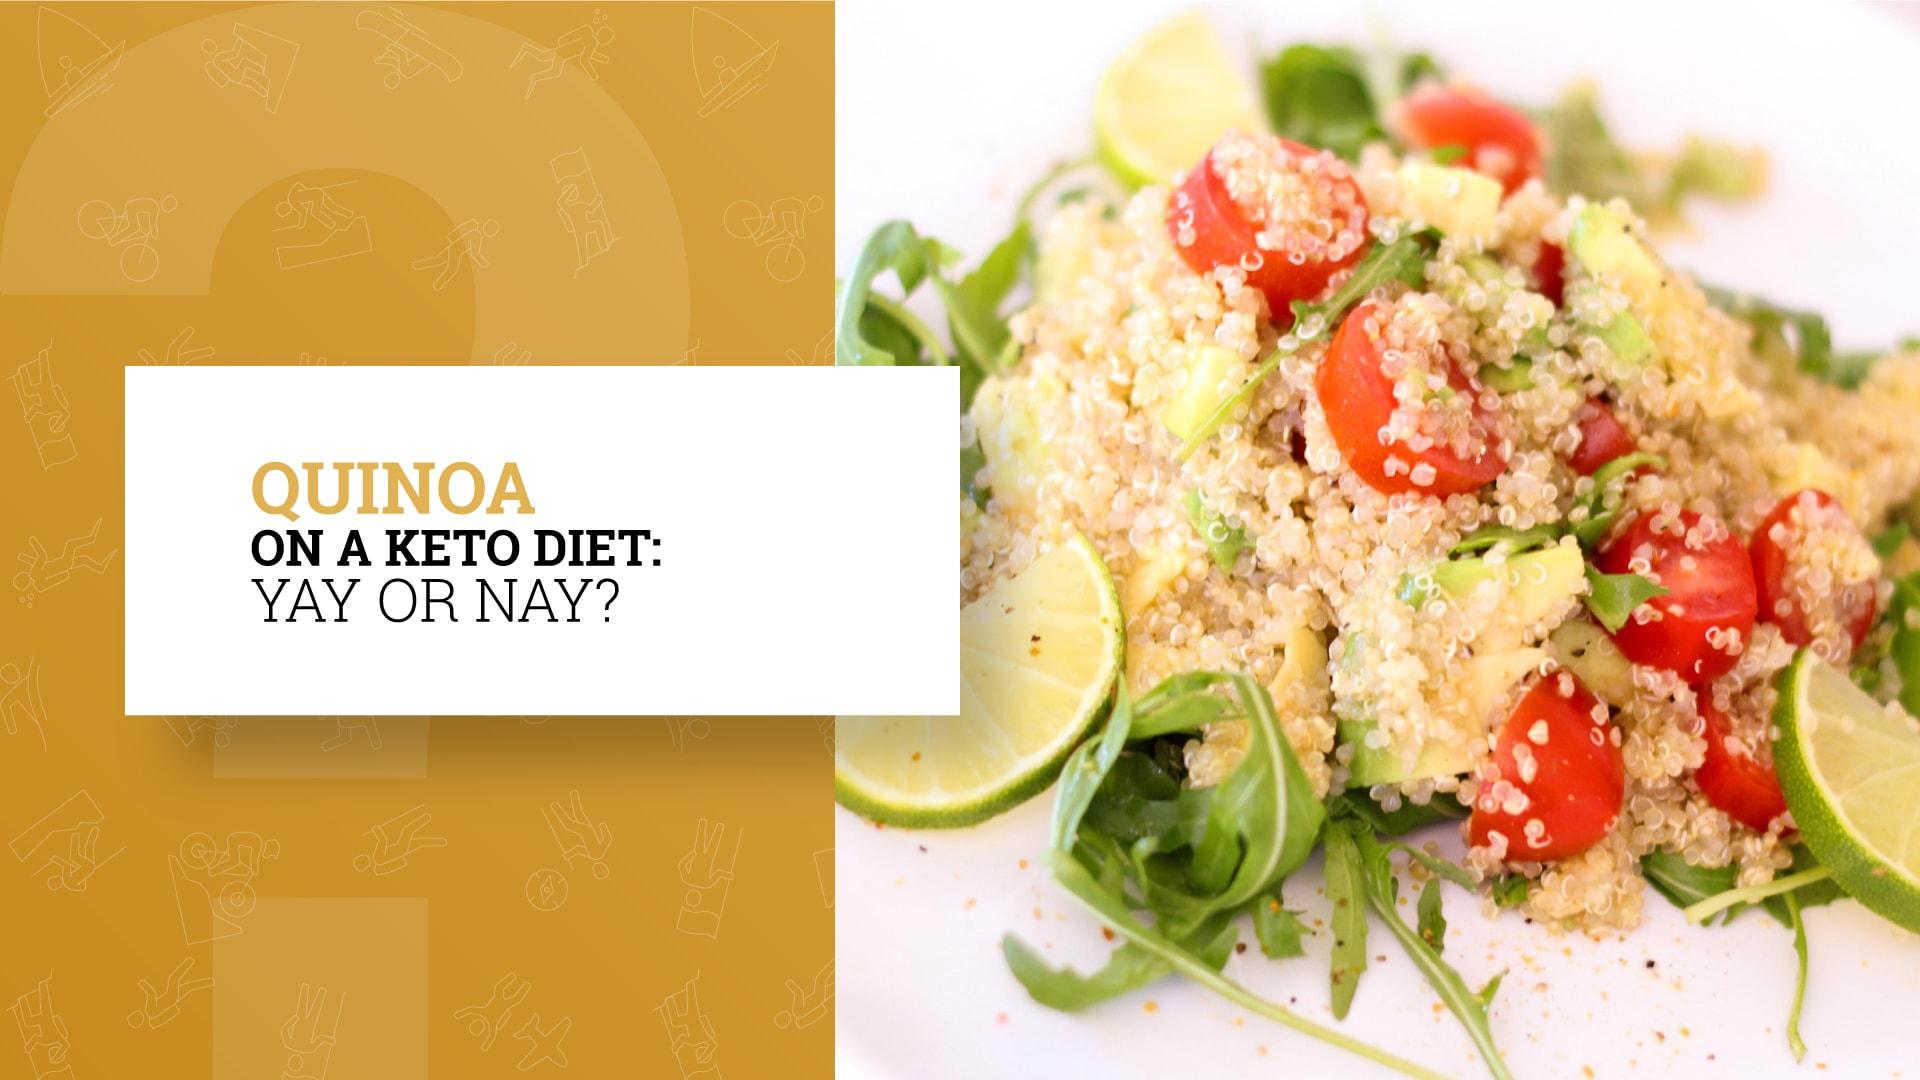 is quinoa keto friendly